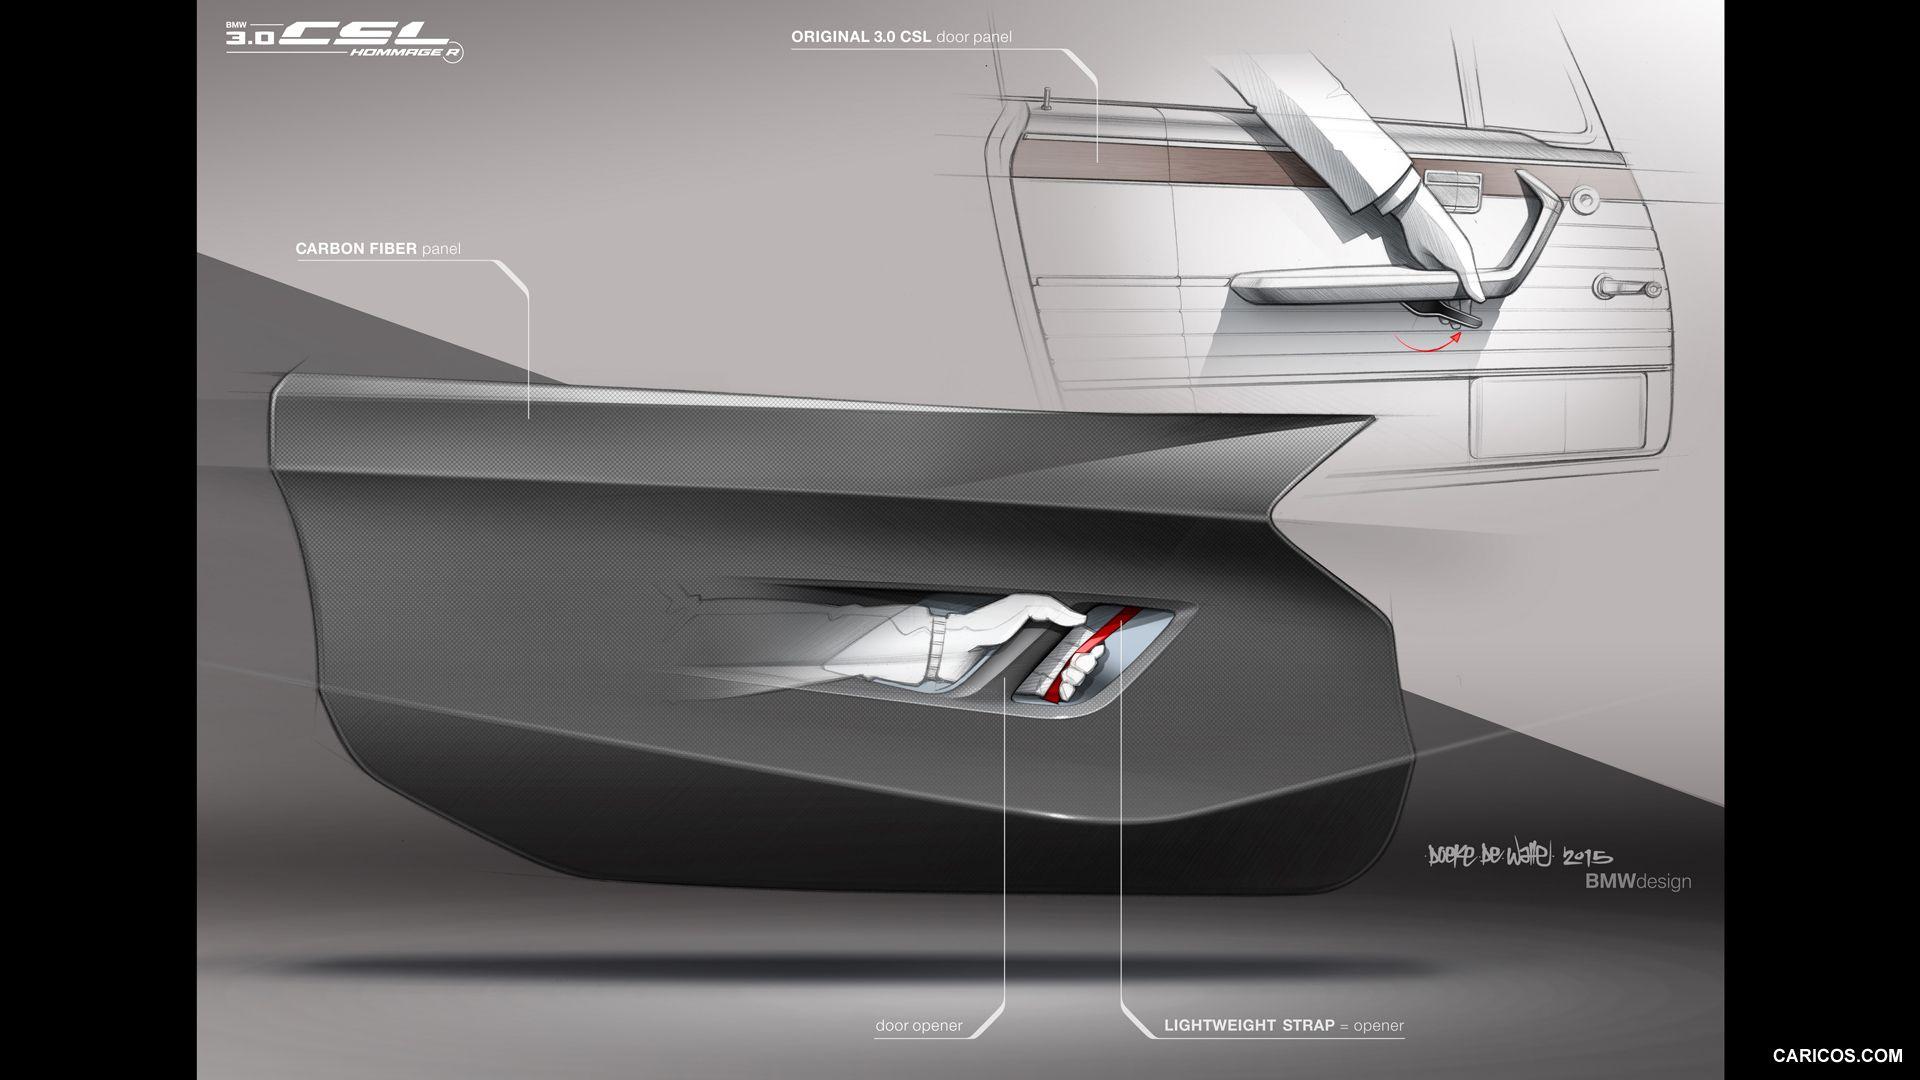 2015 Bmw 3 0 Csl Hommage R Wallpaper Automotive Interiors